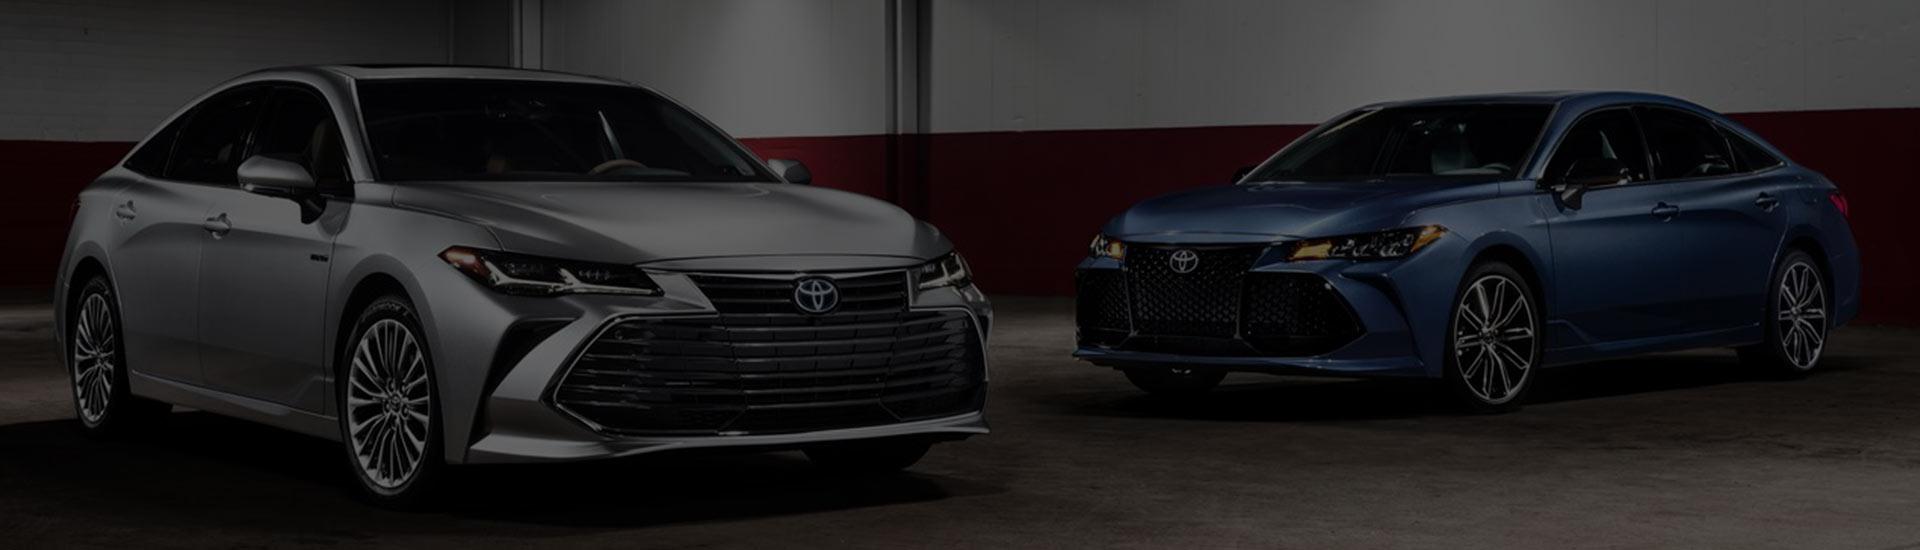 The 2018 Toyota Avalon Vs The 2018 Nissan Maxima at Rivertown Toyota in Columbus, GA